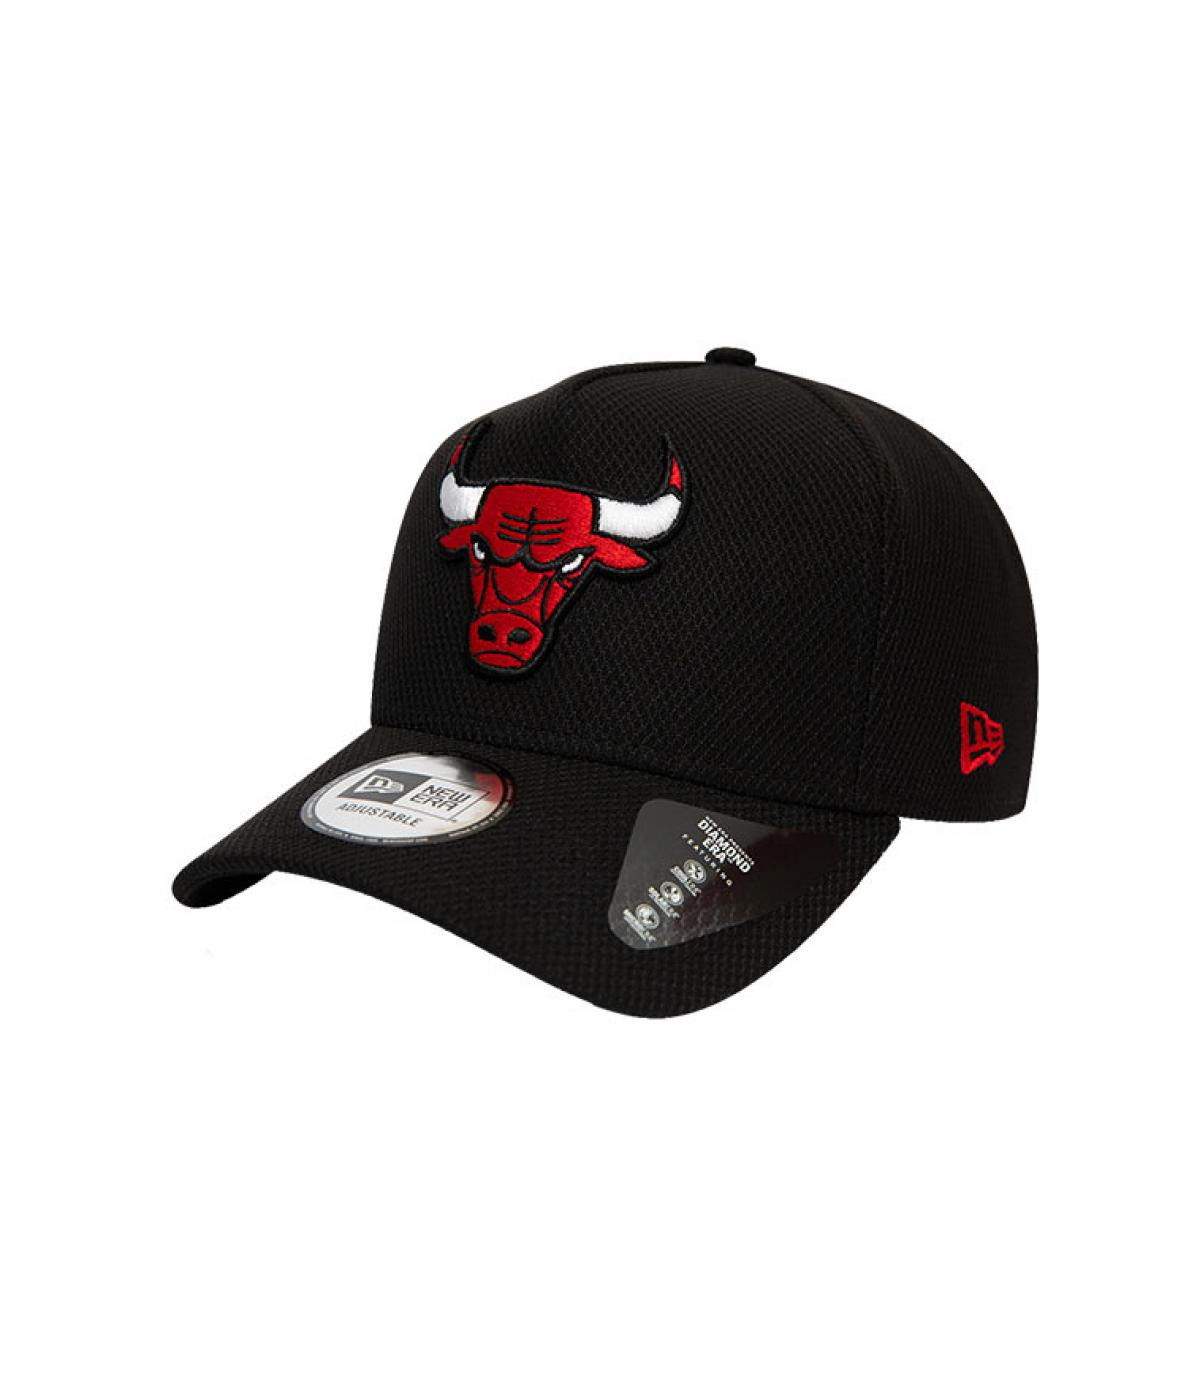 Details League Ess Bulls Diamond Era Aframe - afbeeling 2